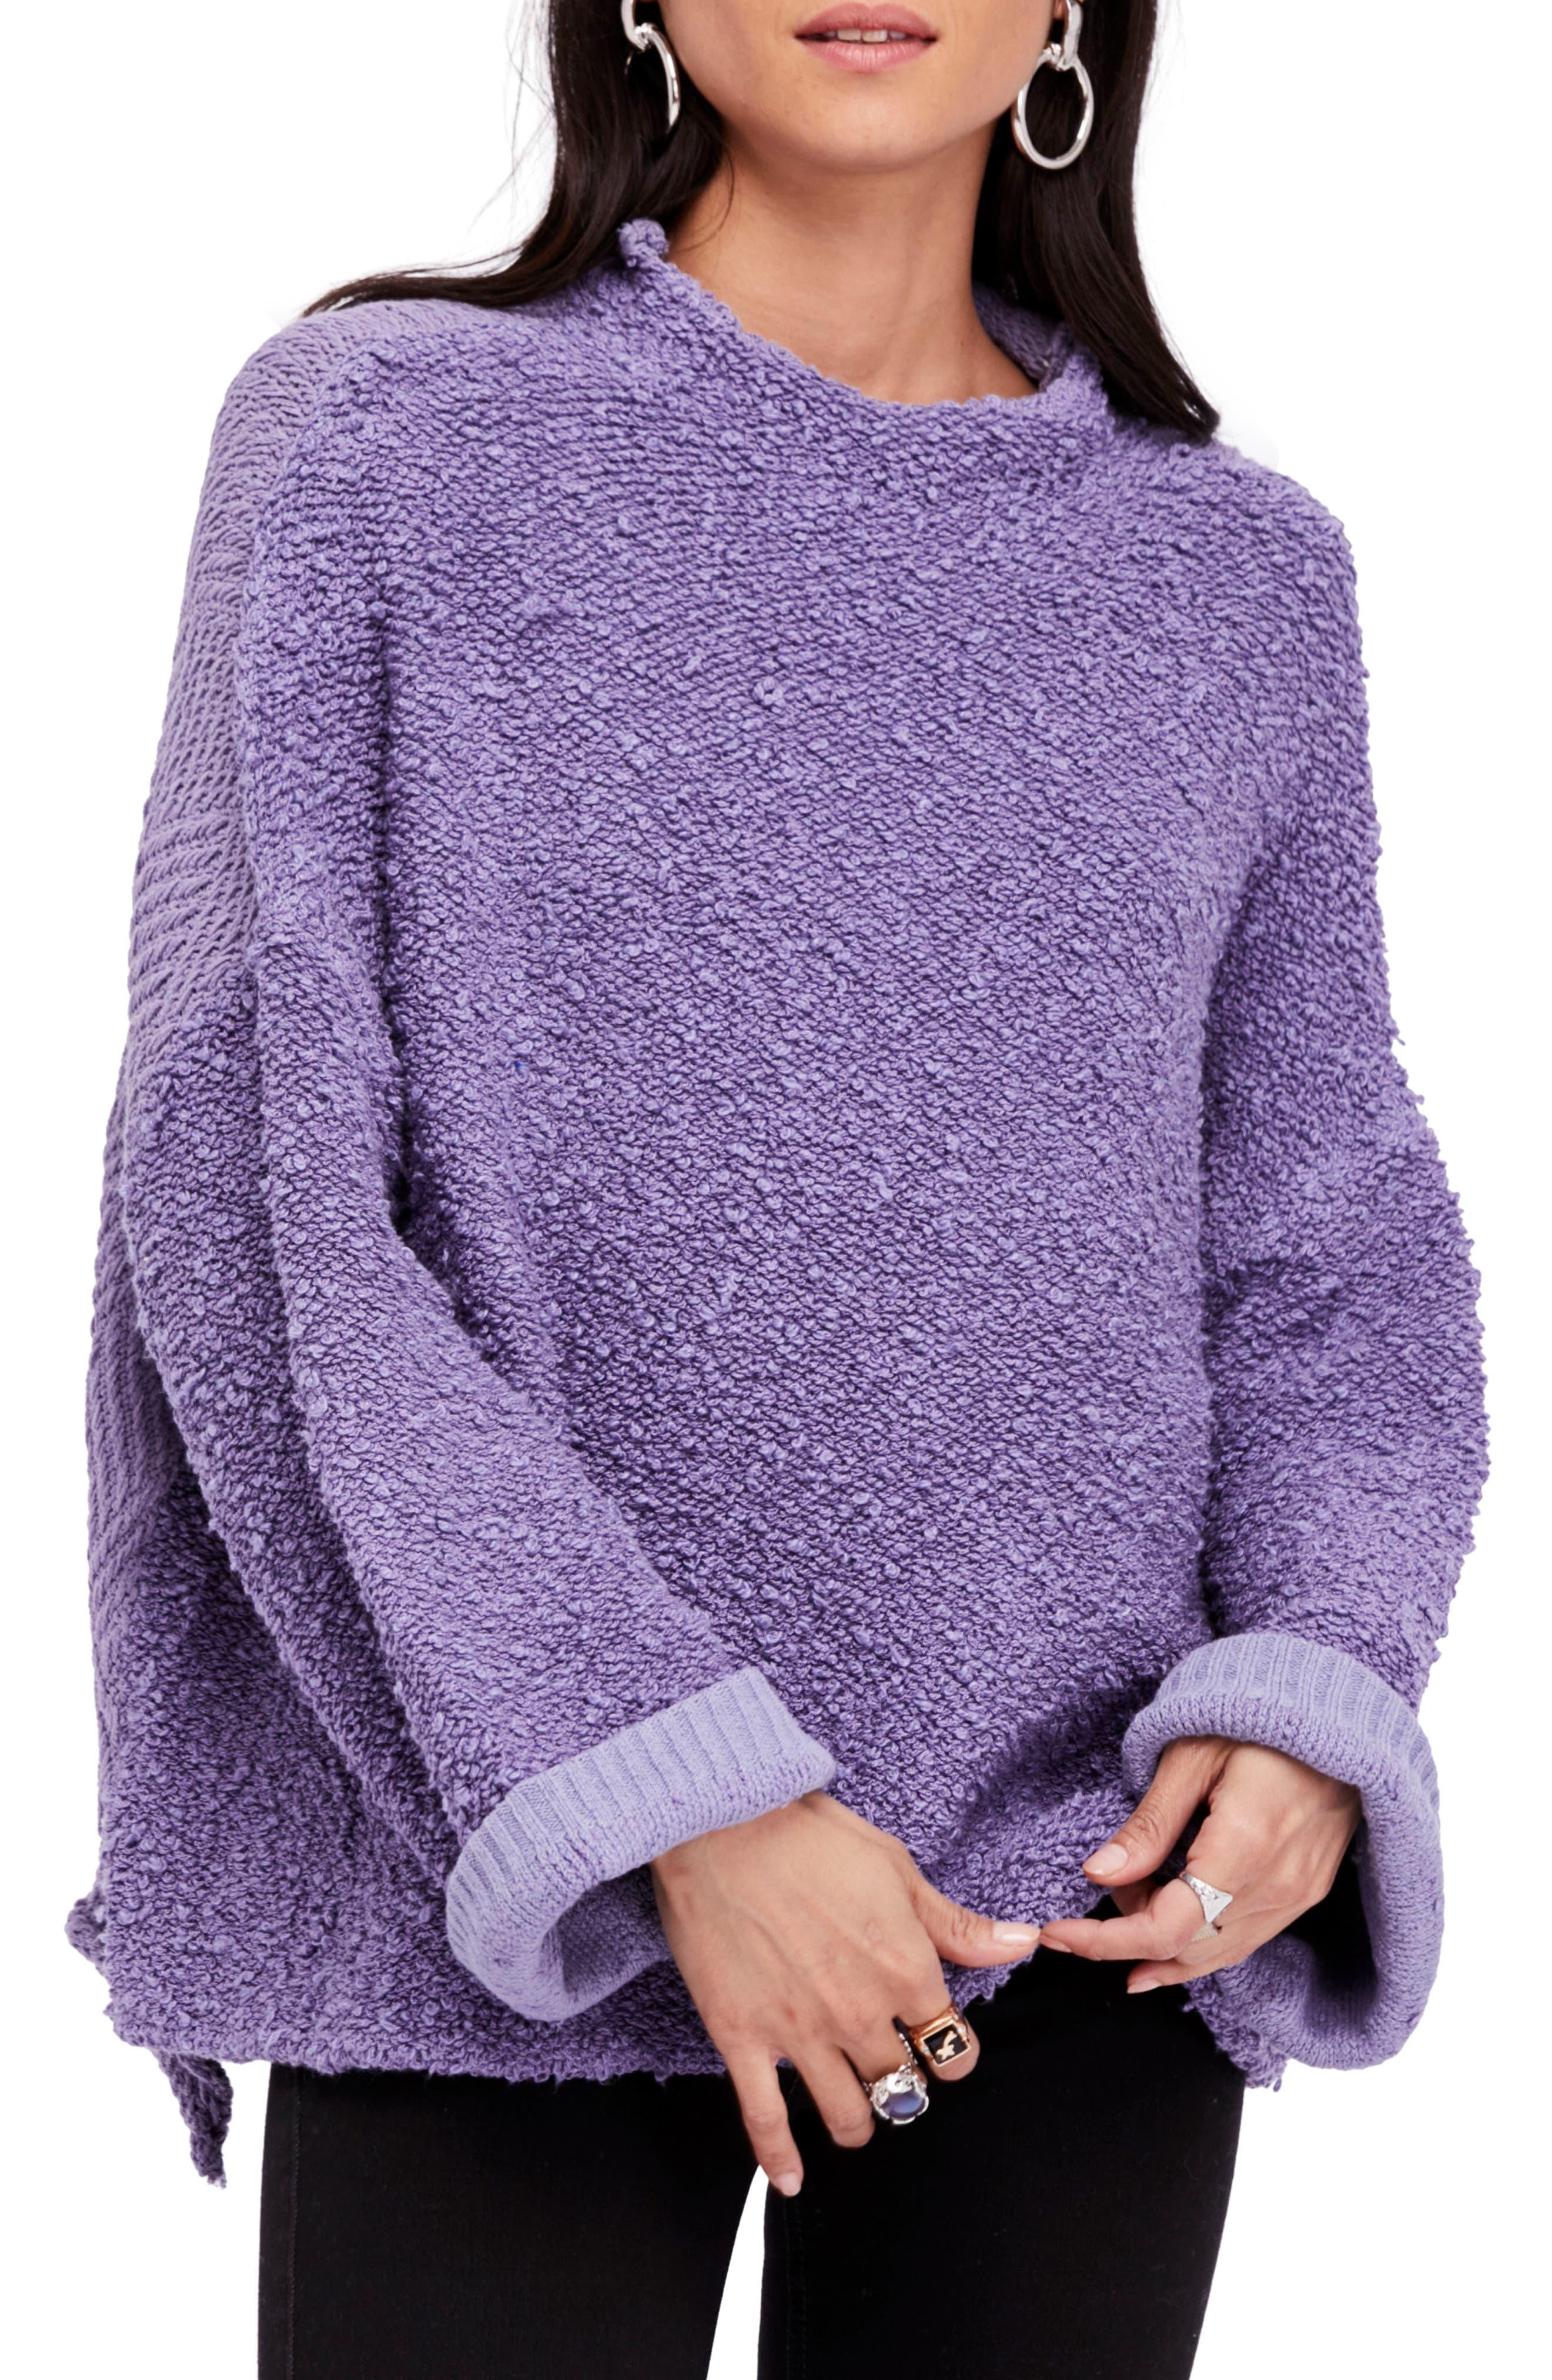 Cuddle Up Pullover,                         Main,                         color, Light Purple